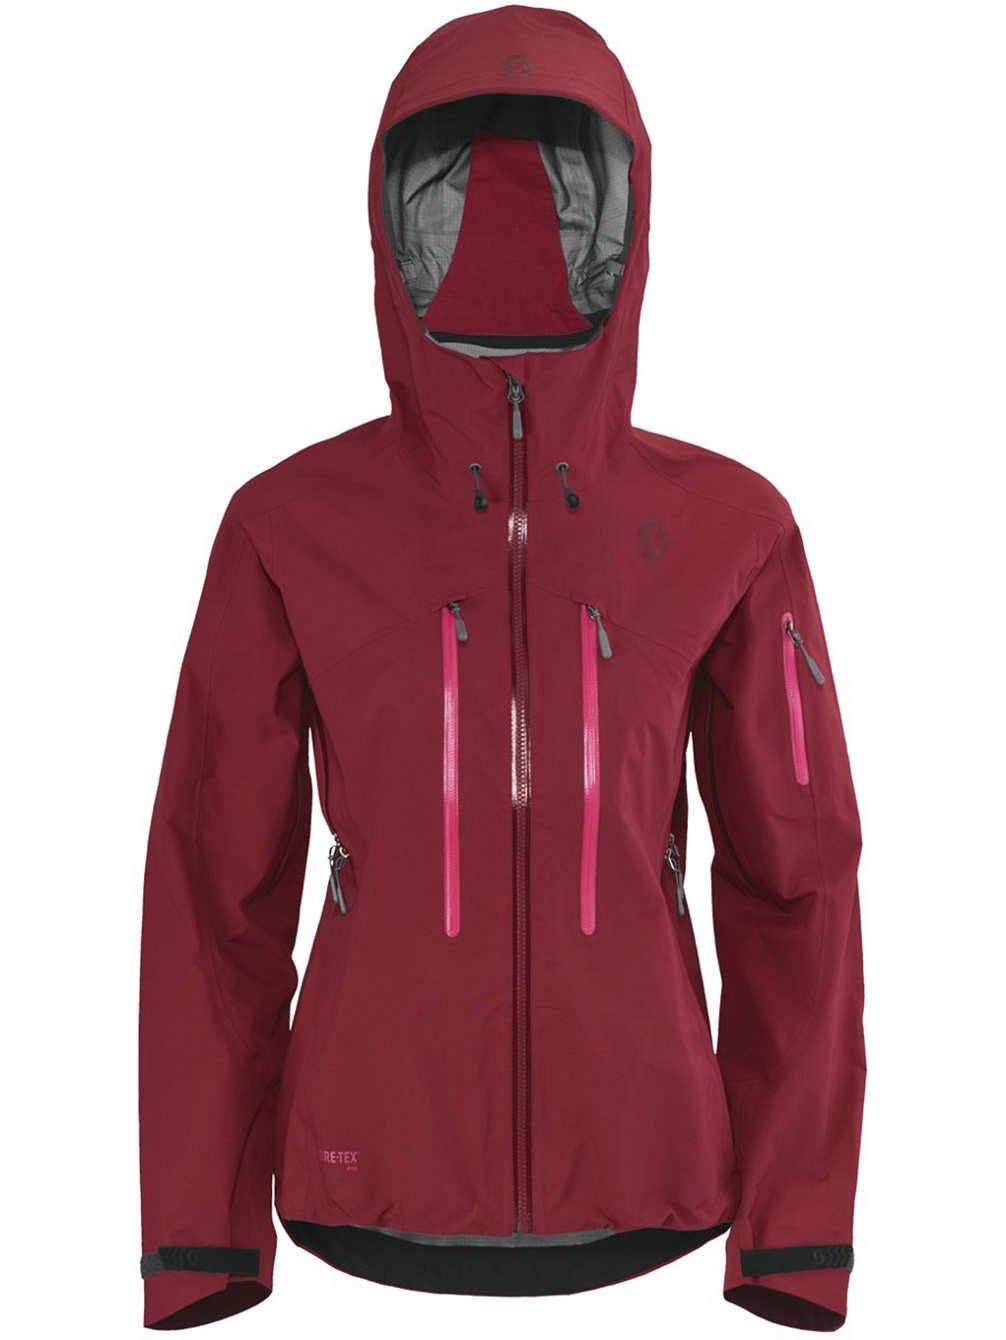 Damen Snowboard Jacke Scott Explorair Jacket günstig